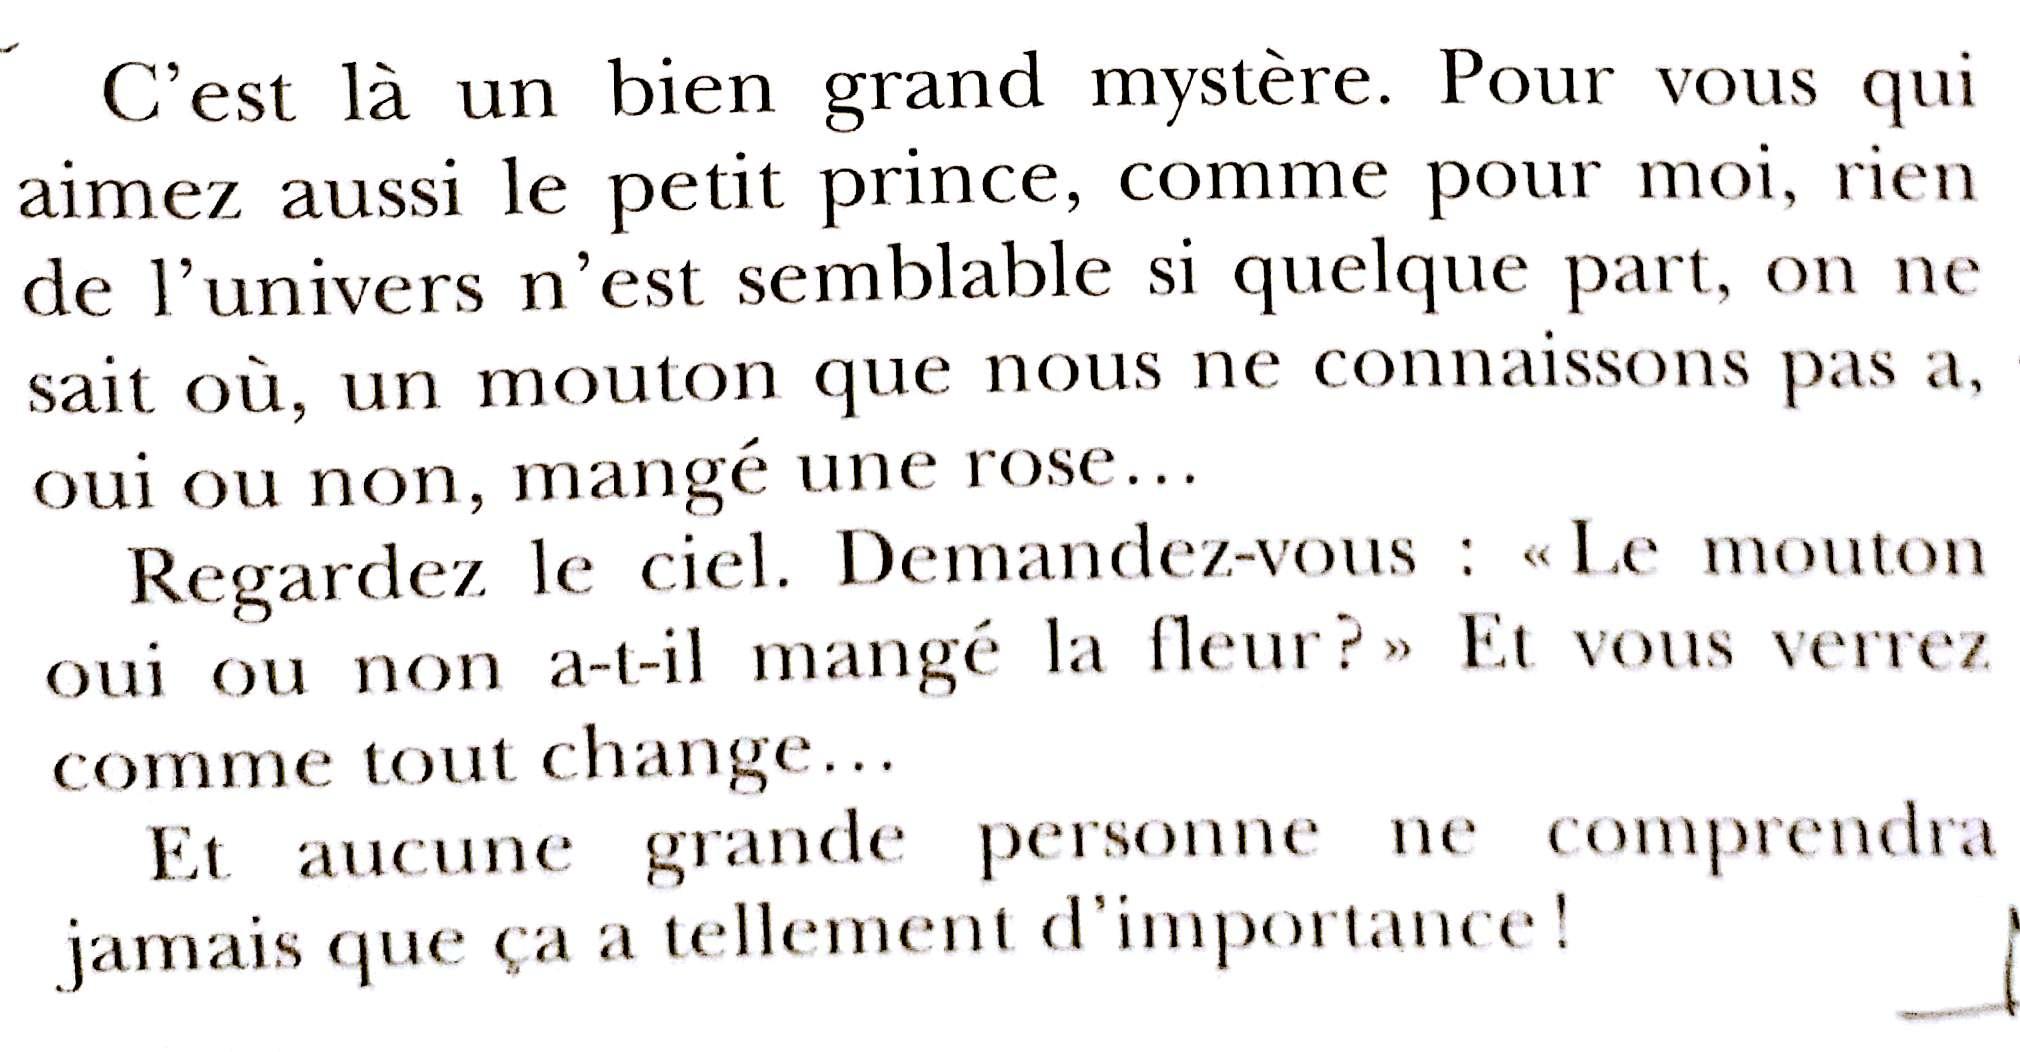 Petit Prince_la fin